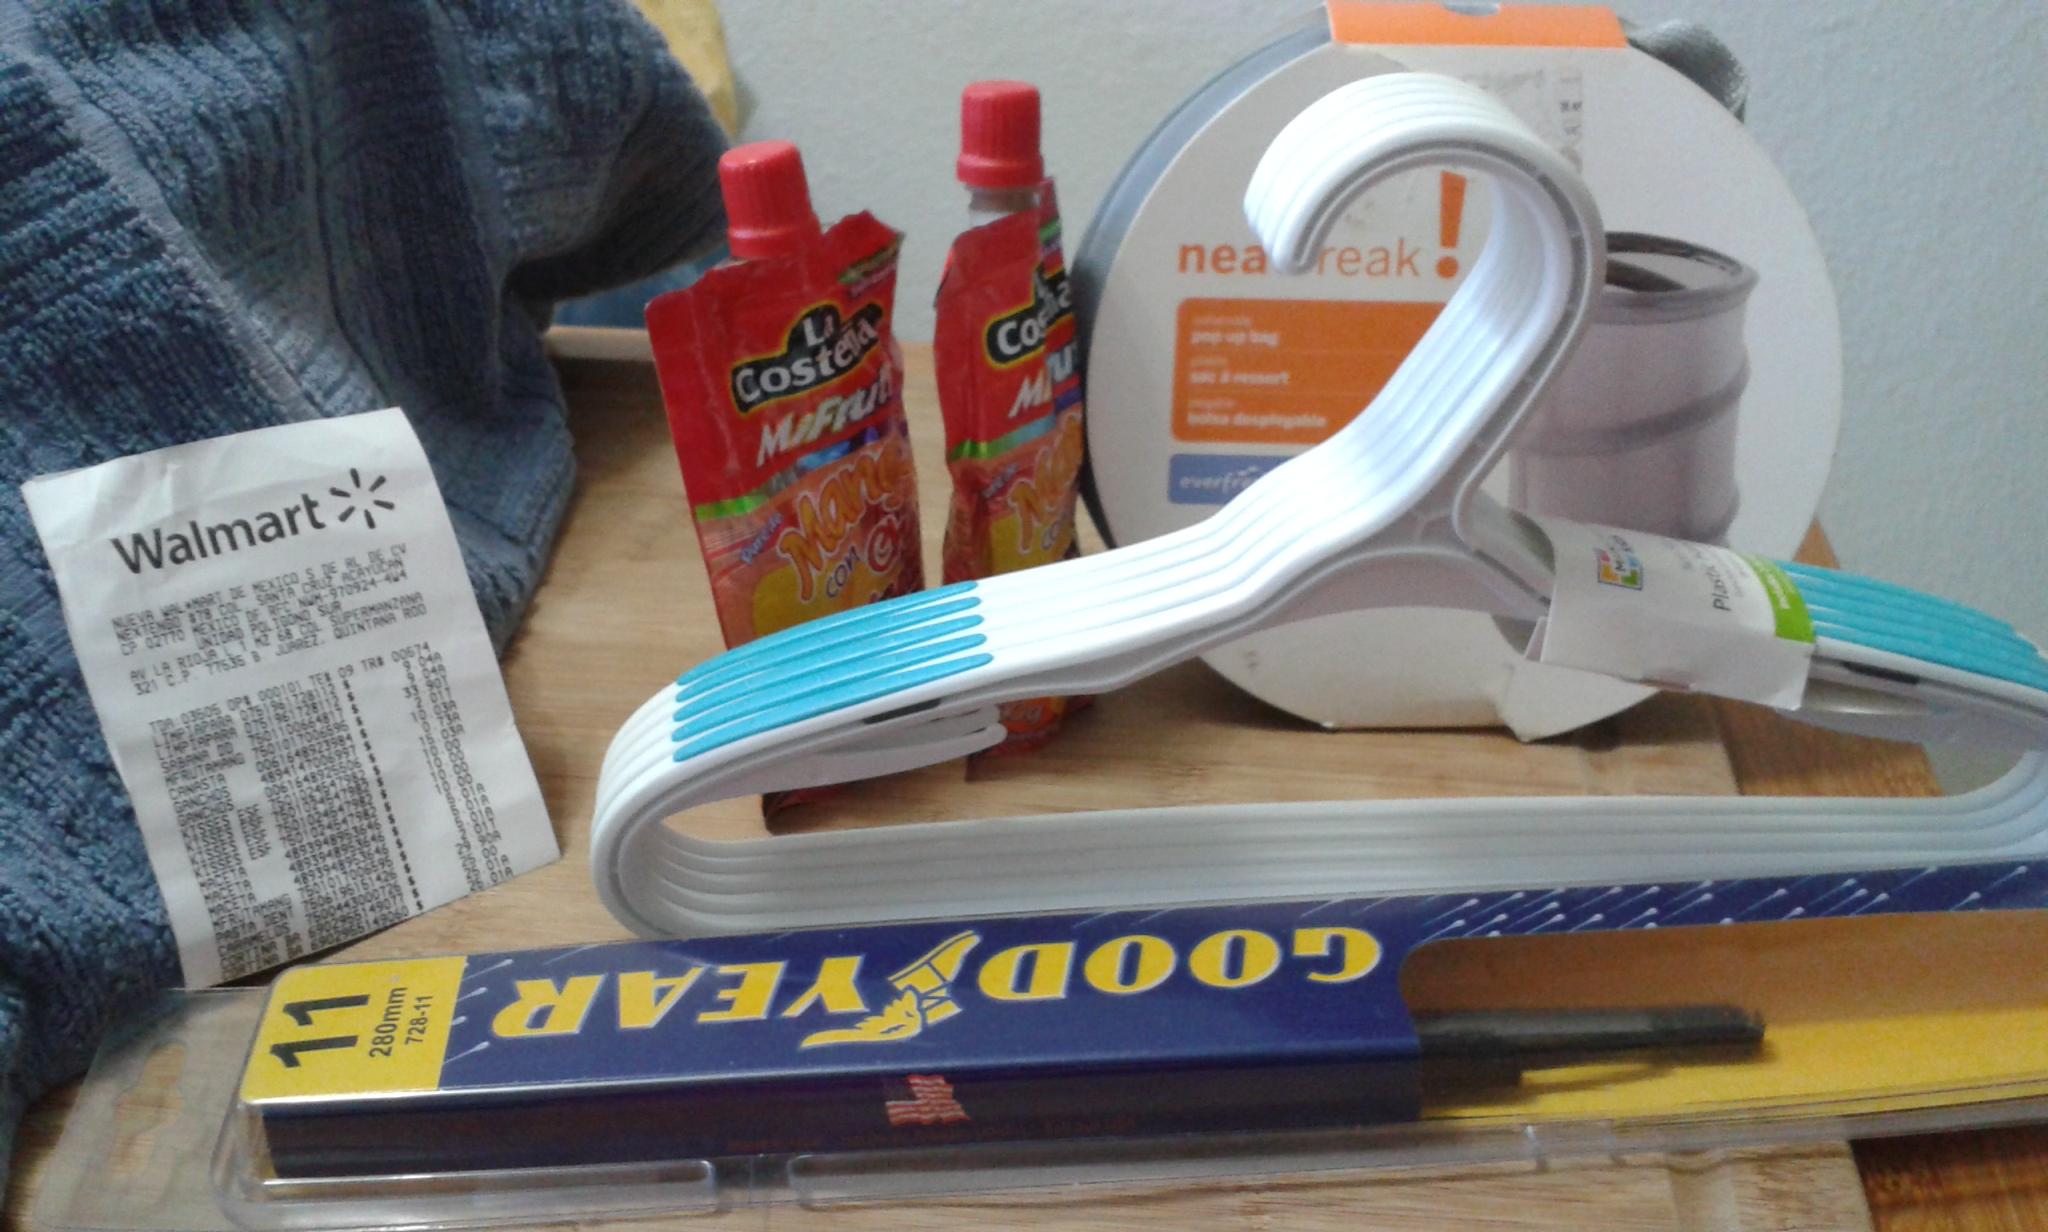 Walmart: Limpiaparabrisas Goodyear a 9.04, Ganchos infantiles a 15.03 y otros